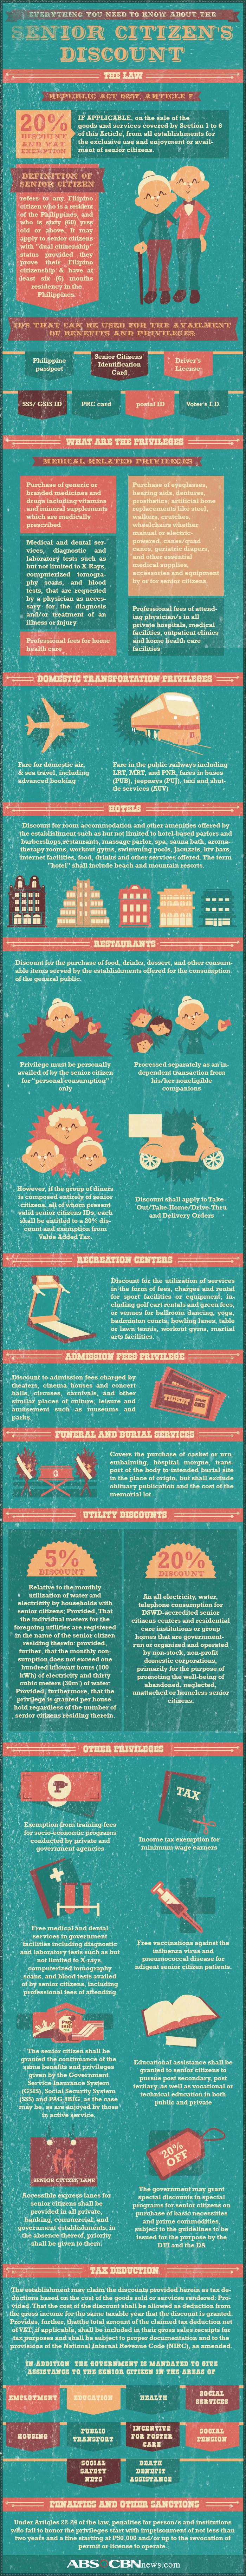 The Senior Citizen's Discounts: Infographic